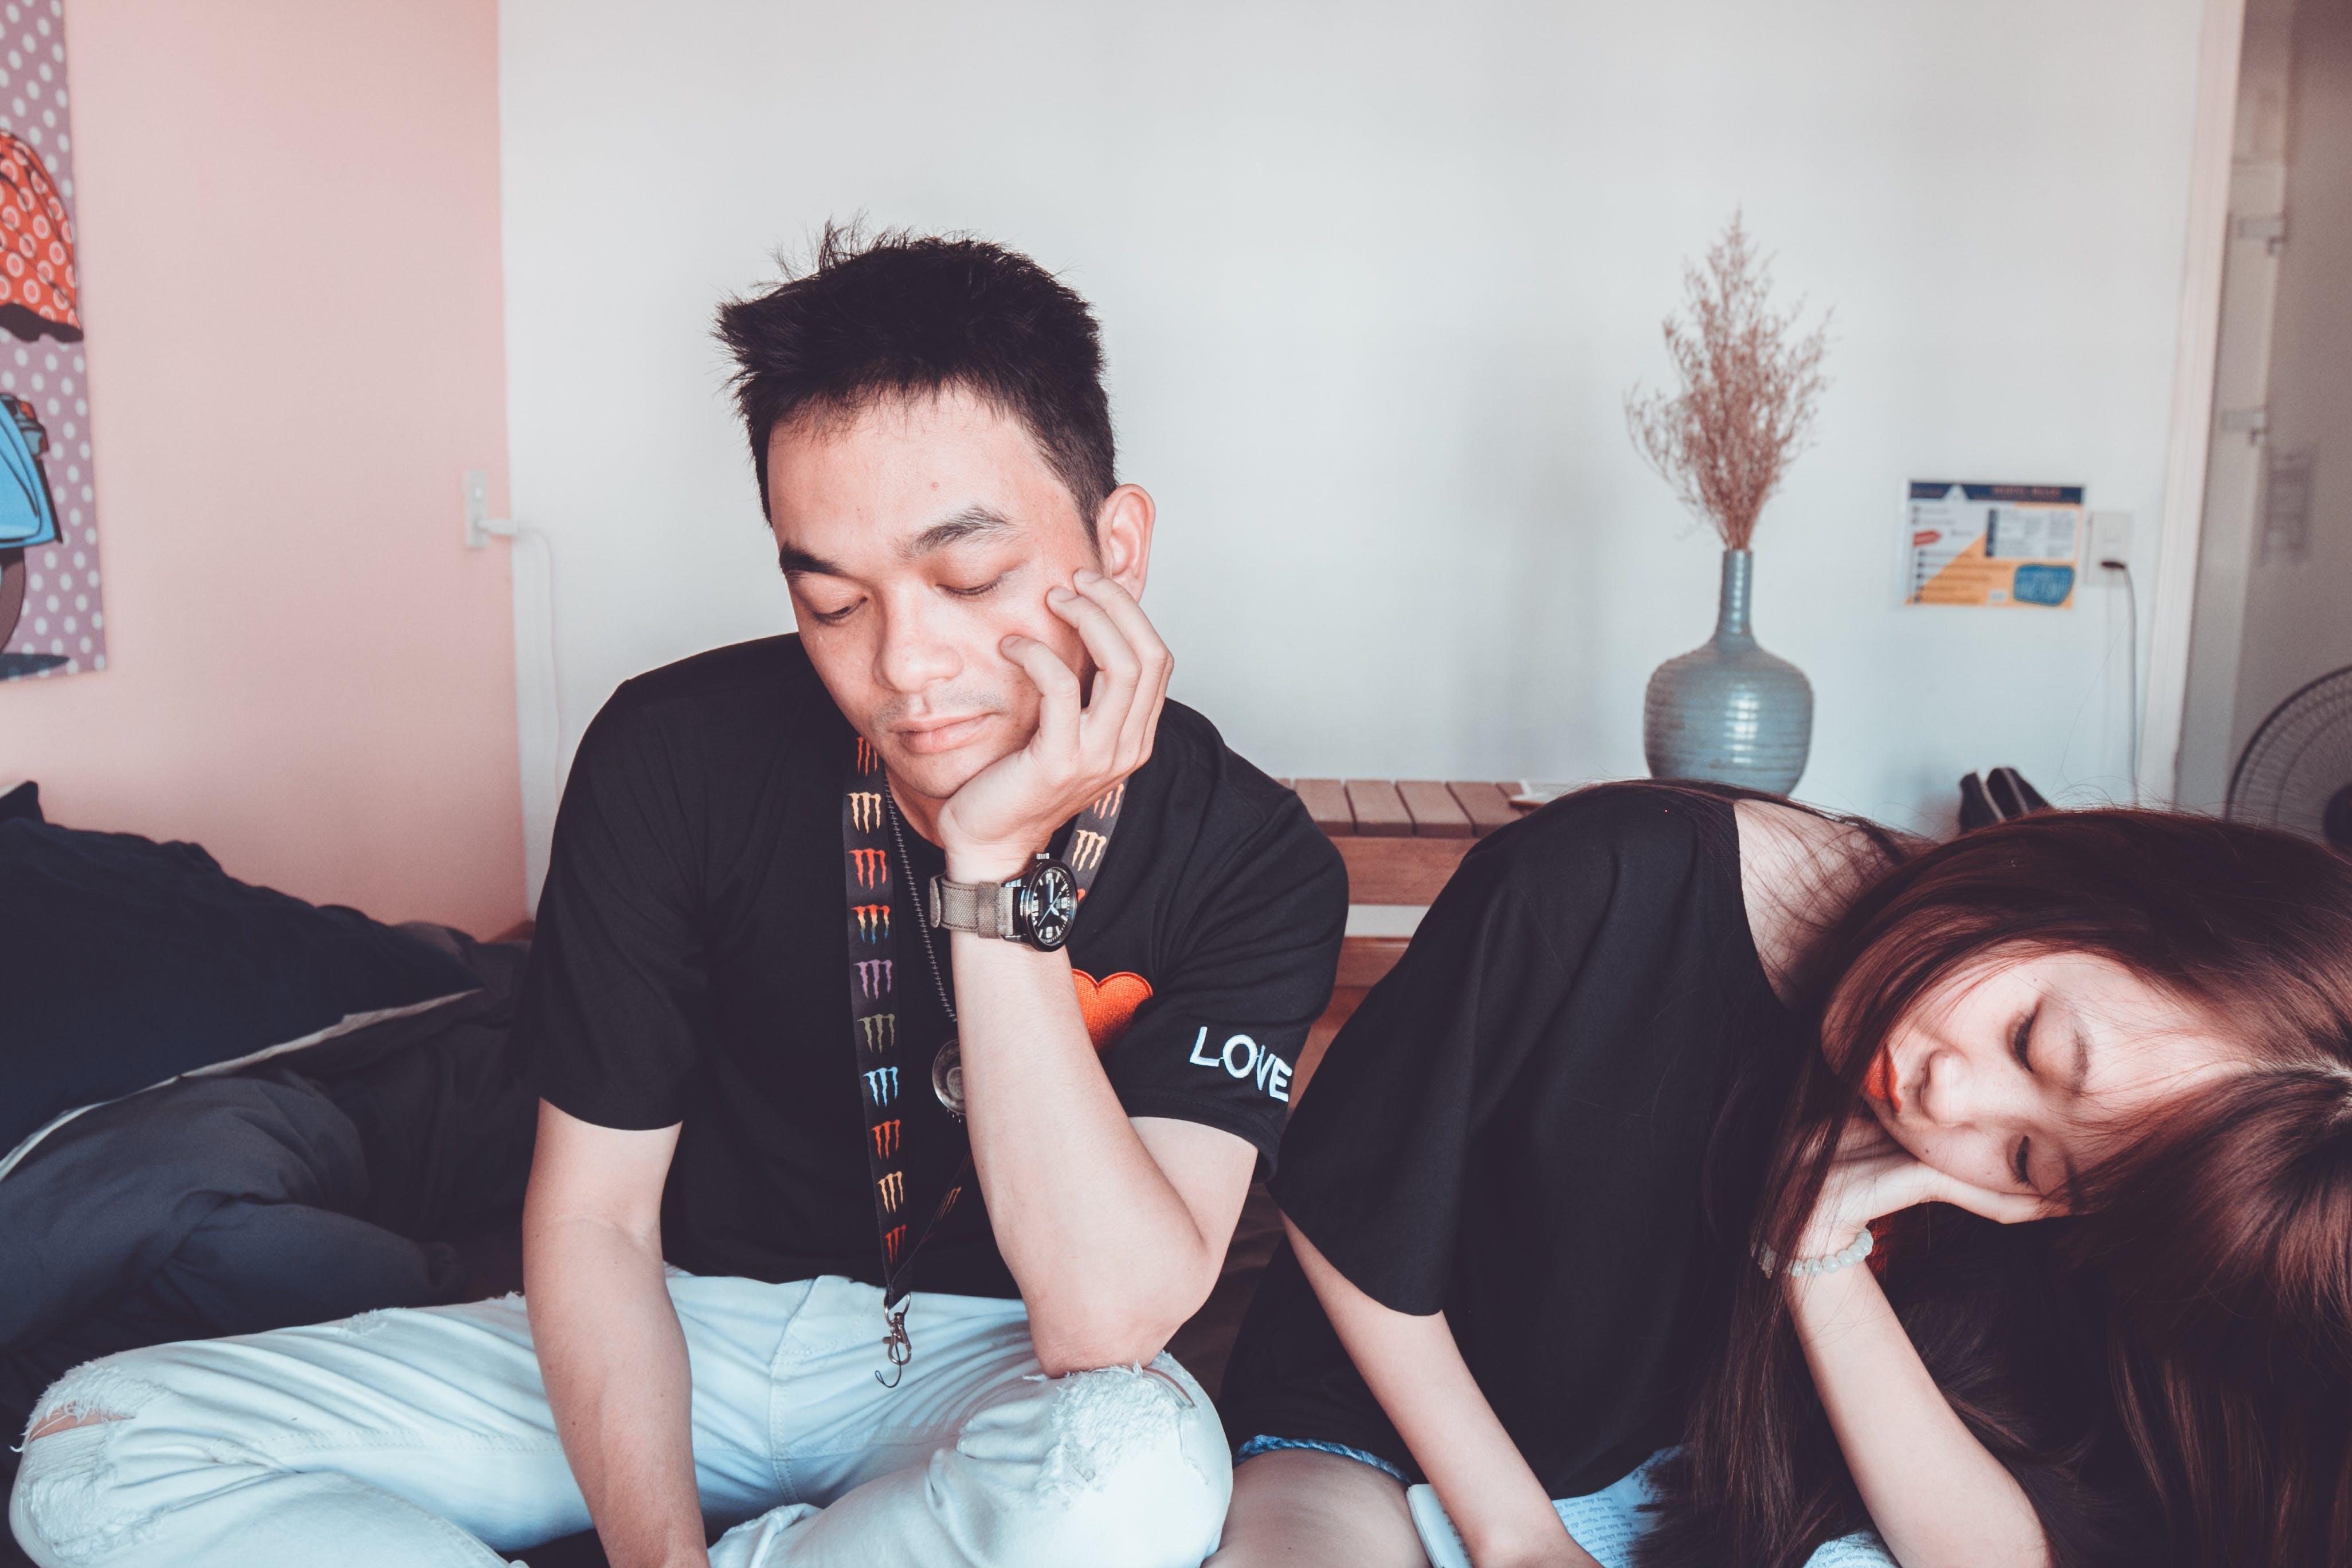 Man Wearing Black Crew-neck Shirt Beside a Woman